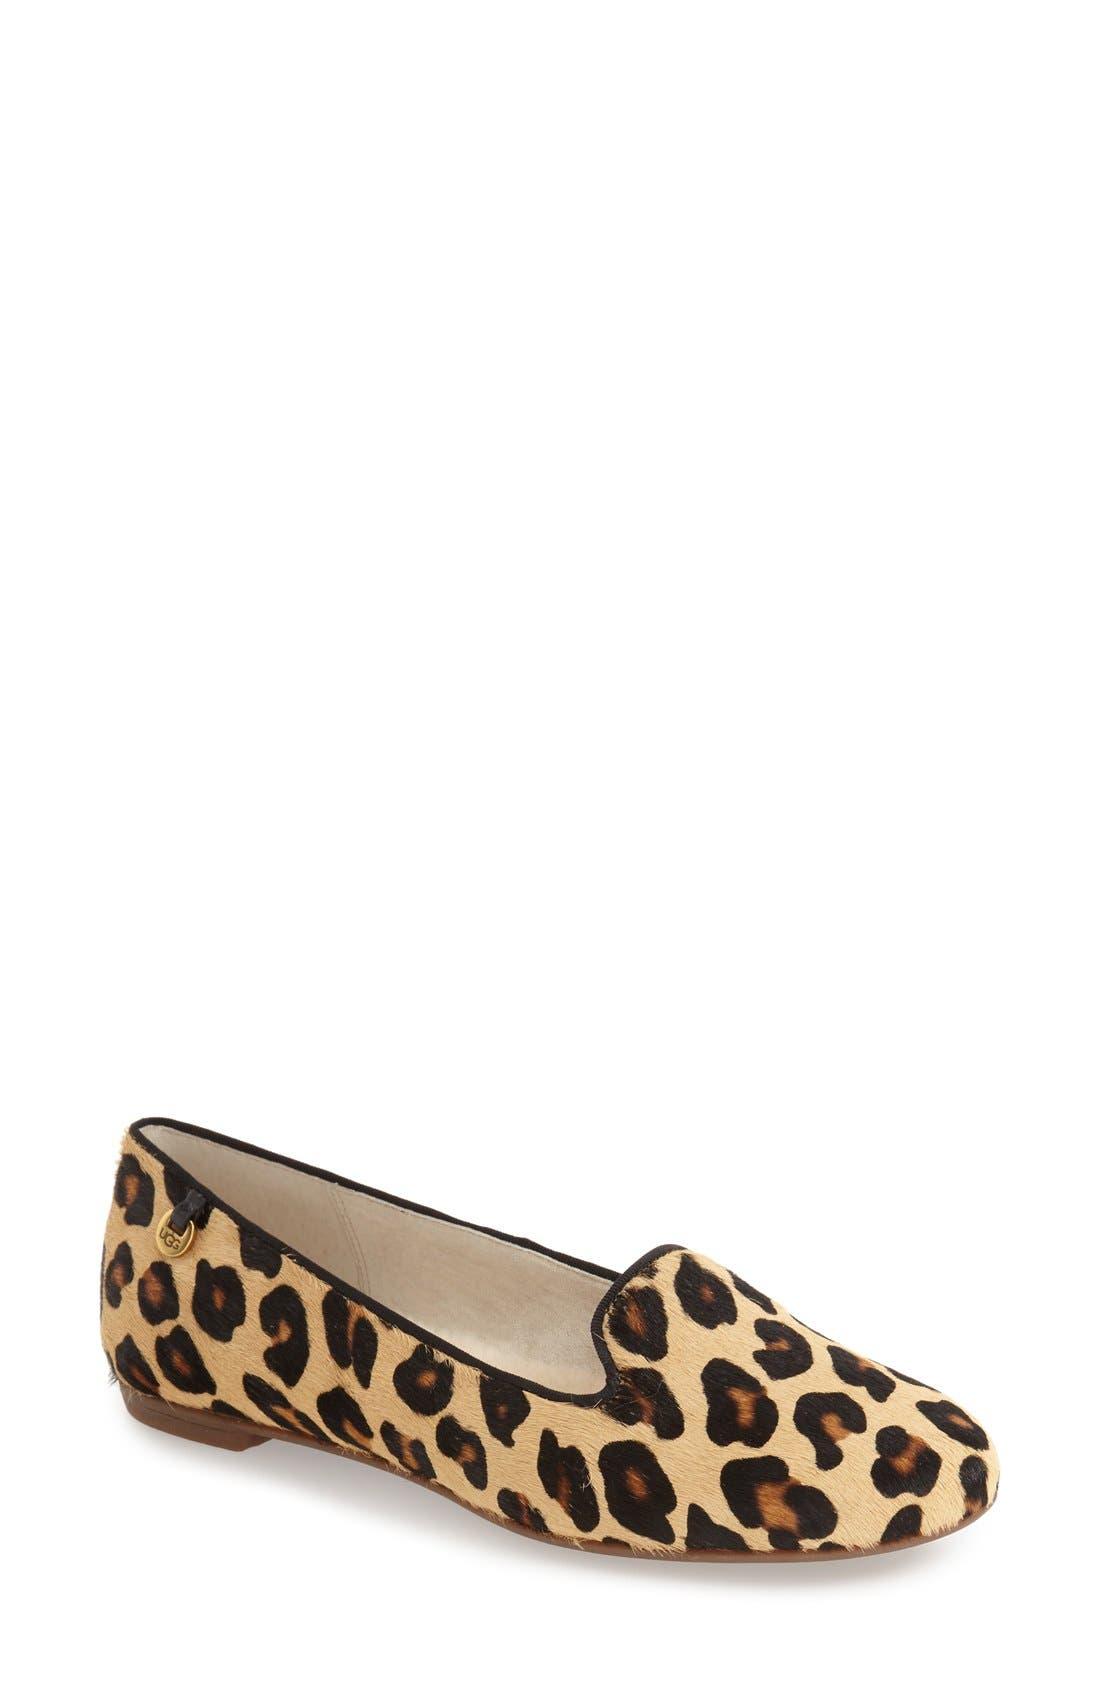 'Blyss' Leopard Spot Calf Hair Flat,                             Main thumbnail 1, color,                             200